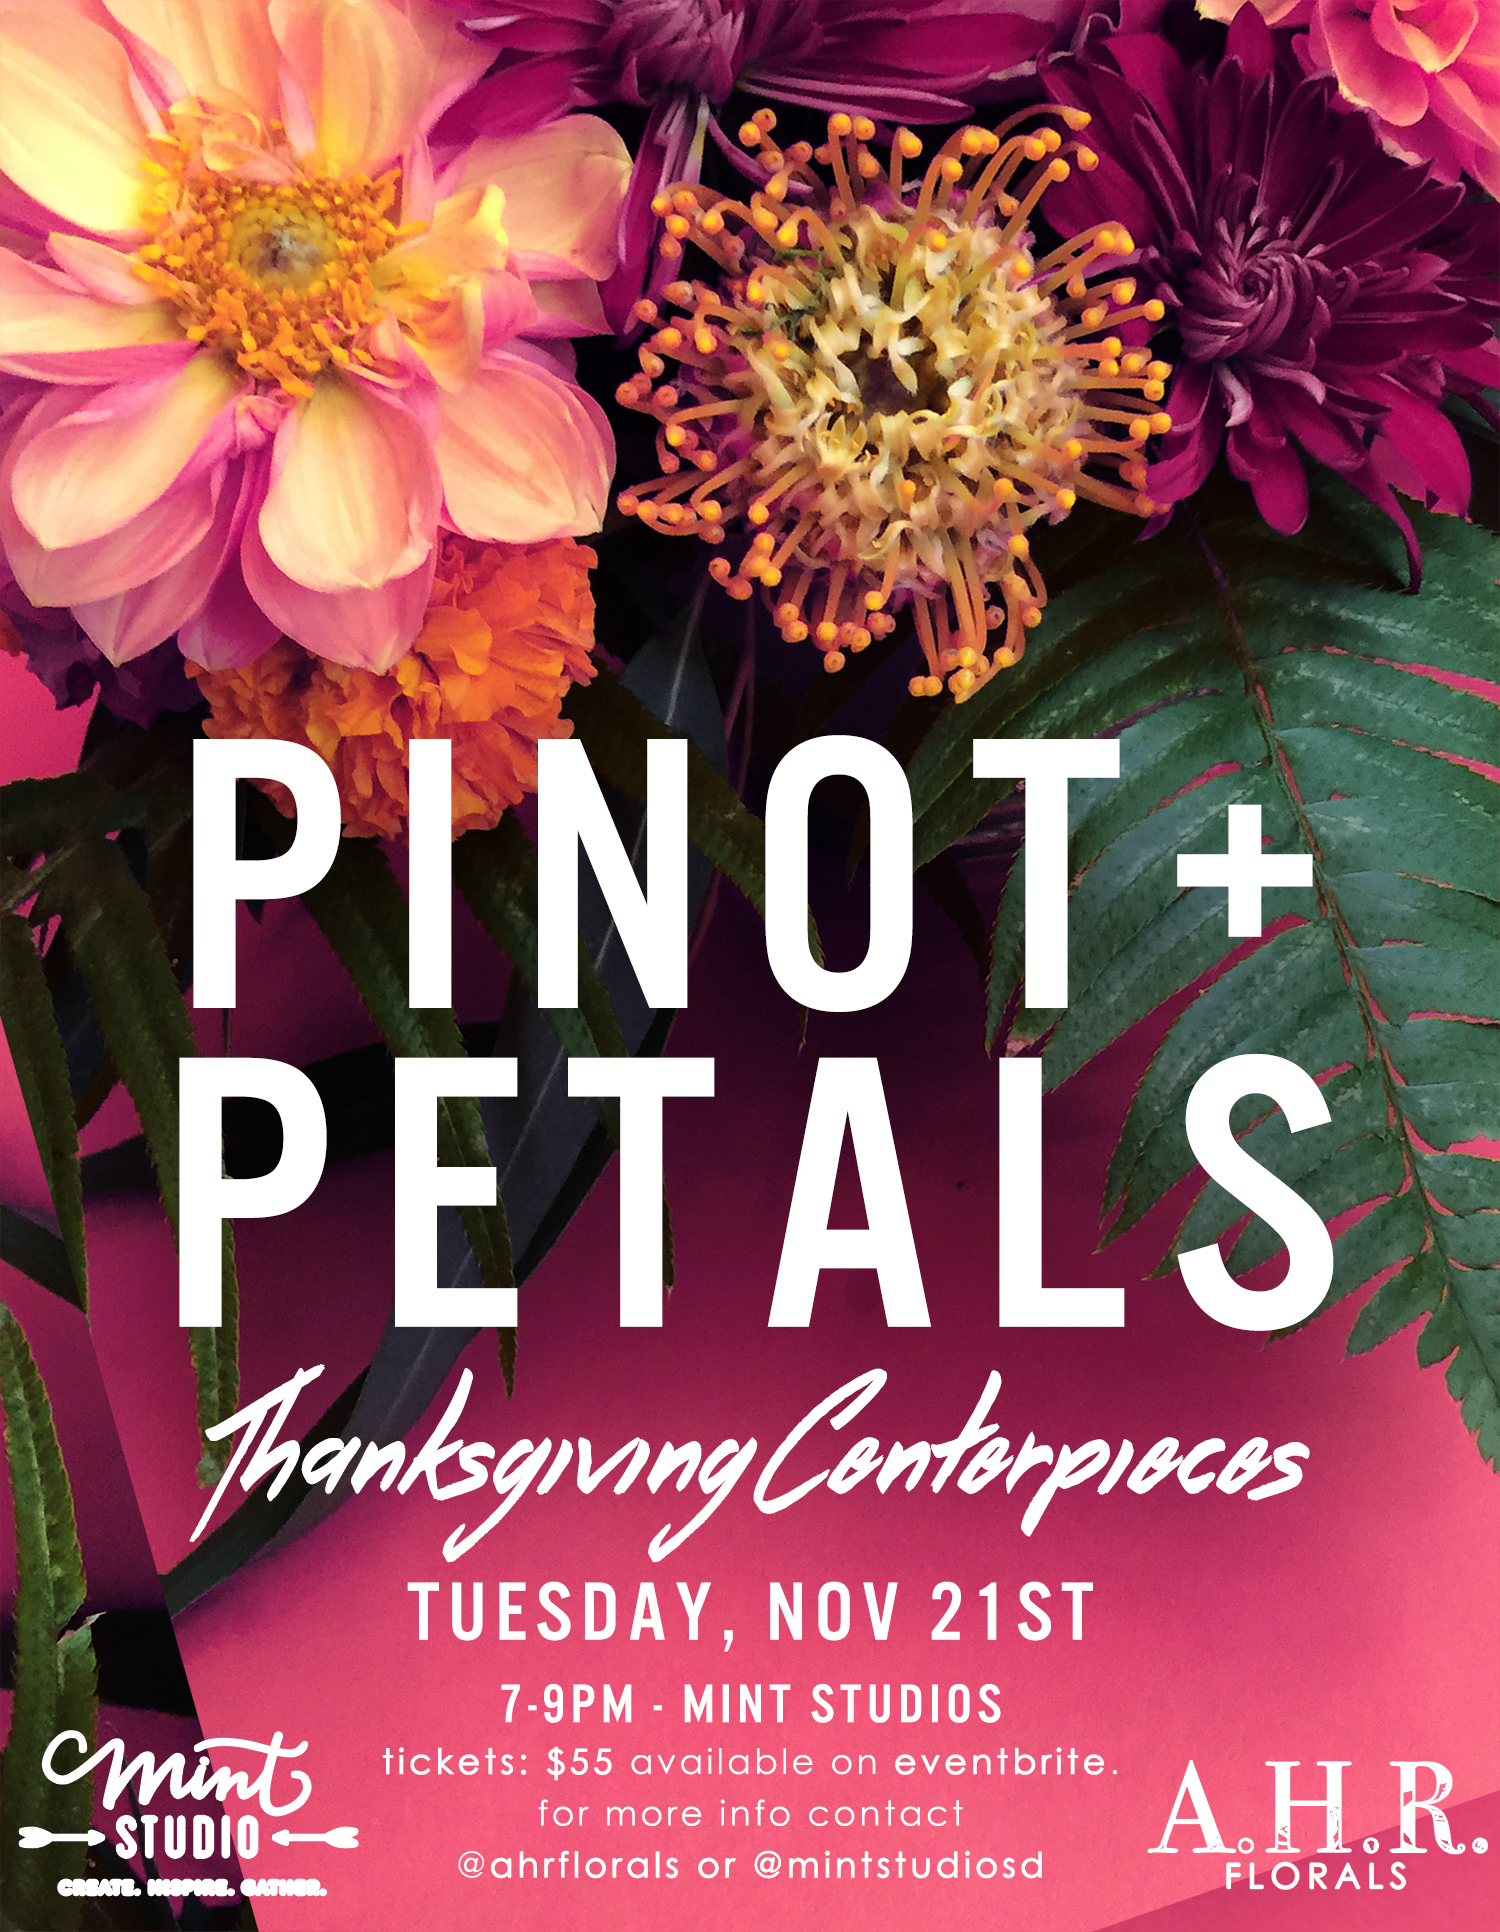 Pinot+Petals-Mint-Studios-WineandFloralDesign.jpg